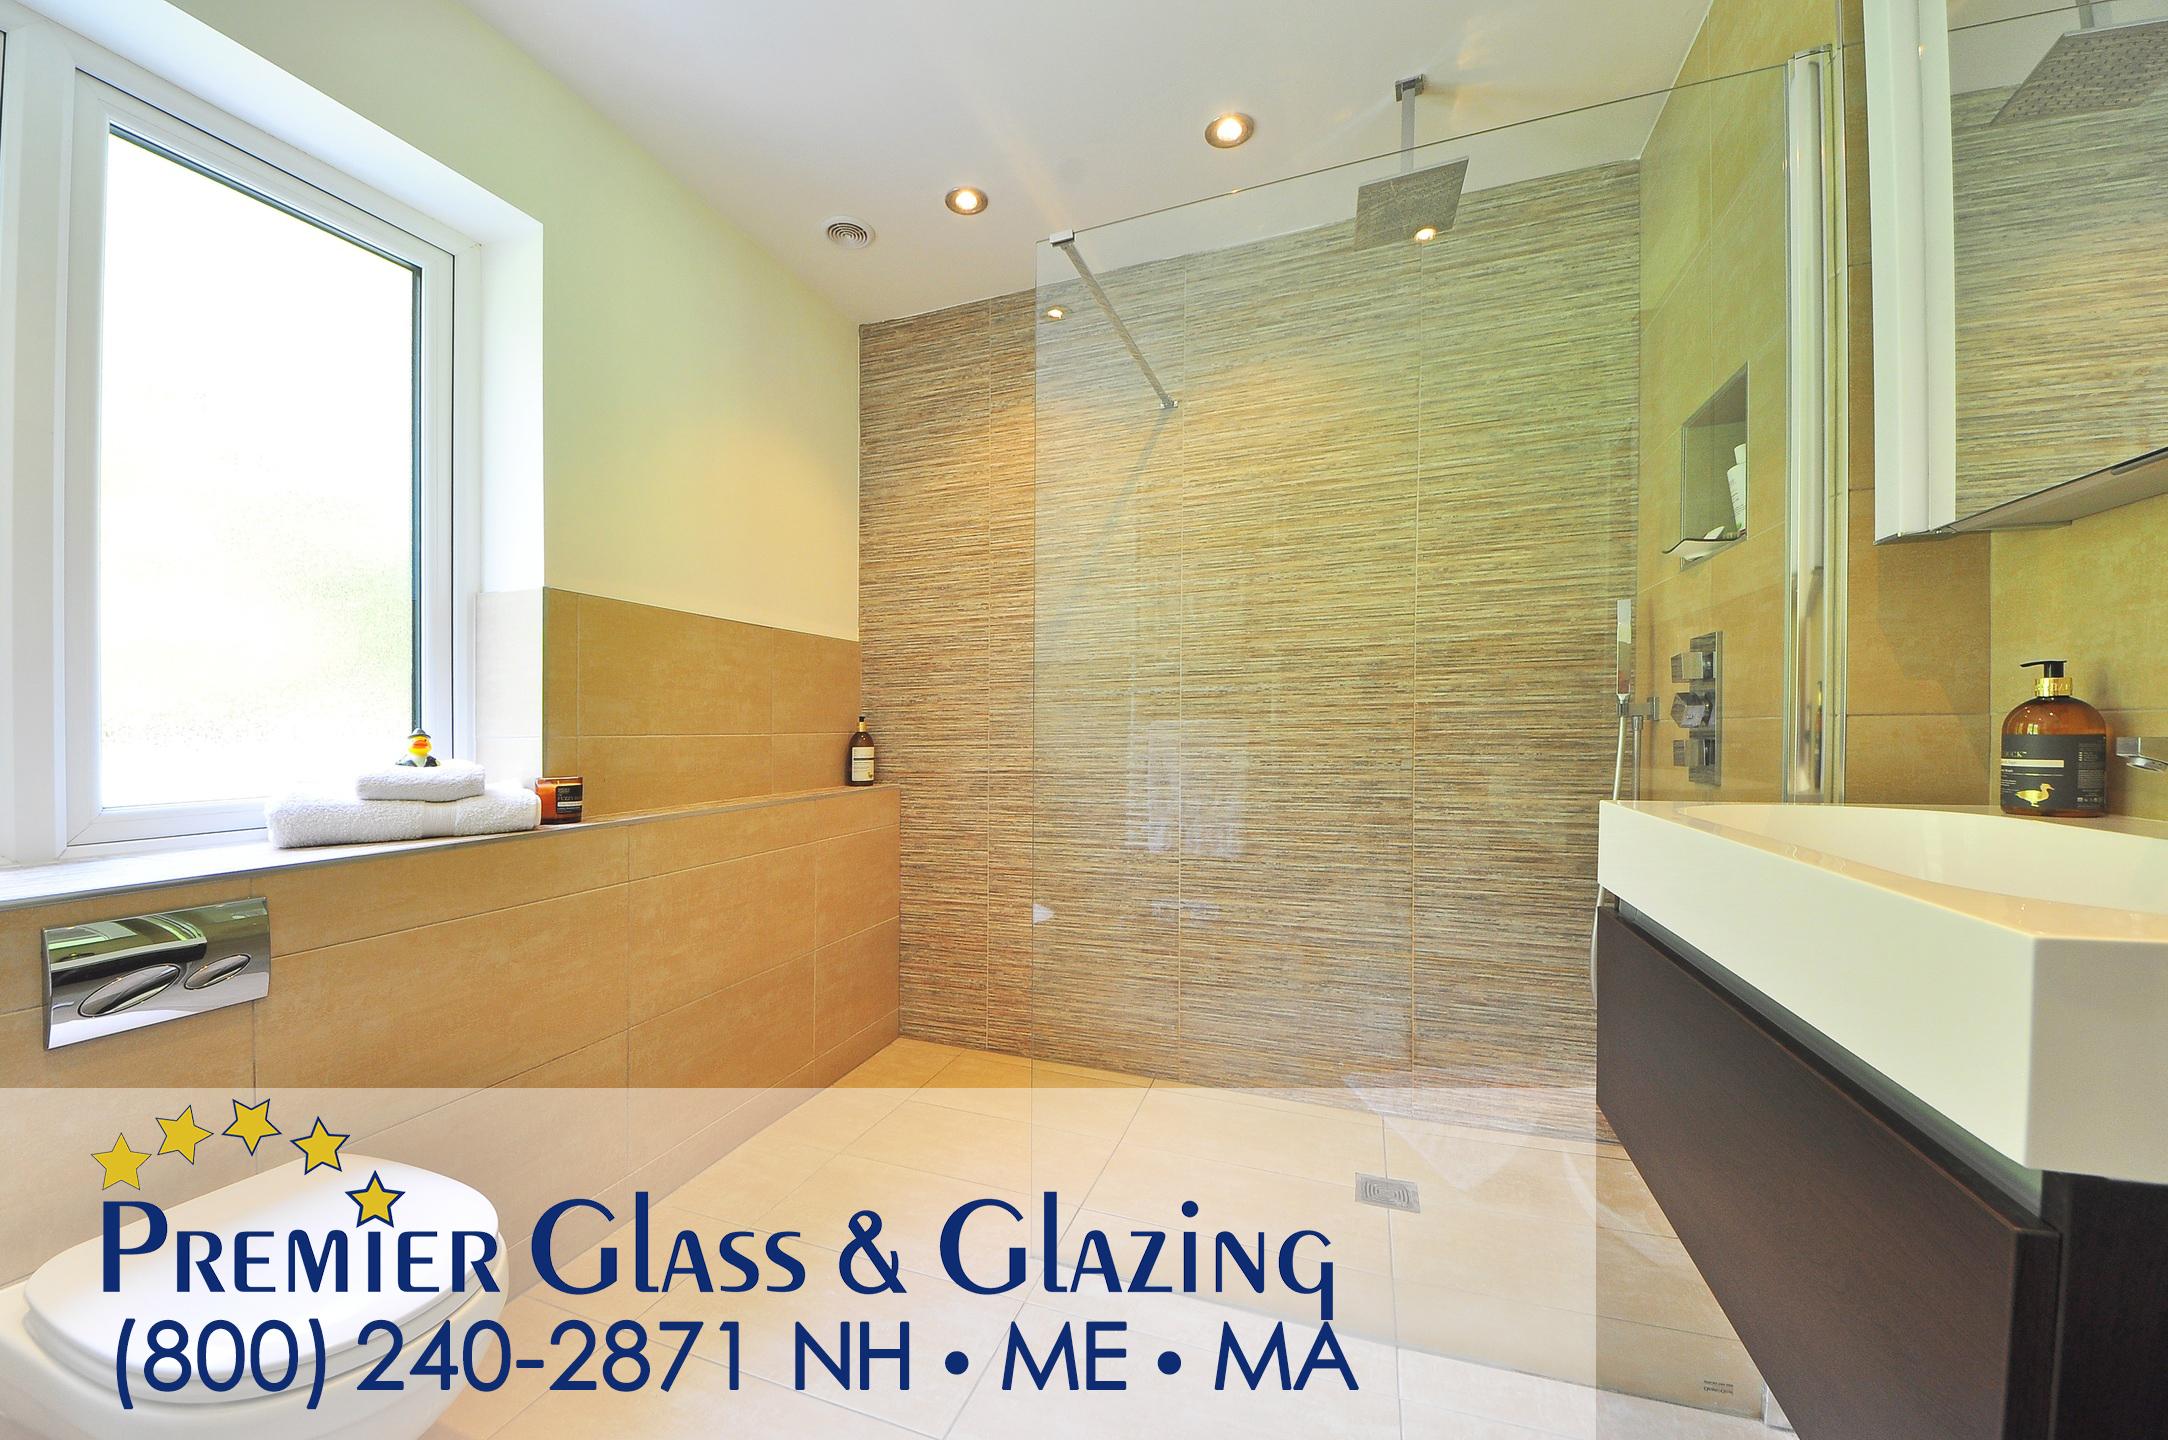 Glass Repair Service | NH ME MA | Premier Glass & Glazing